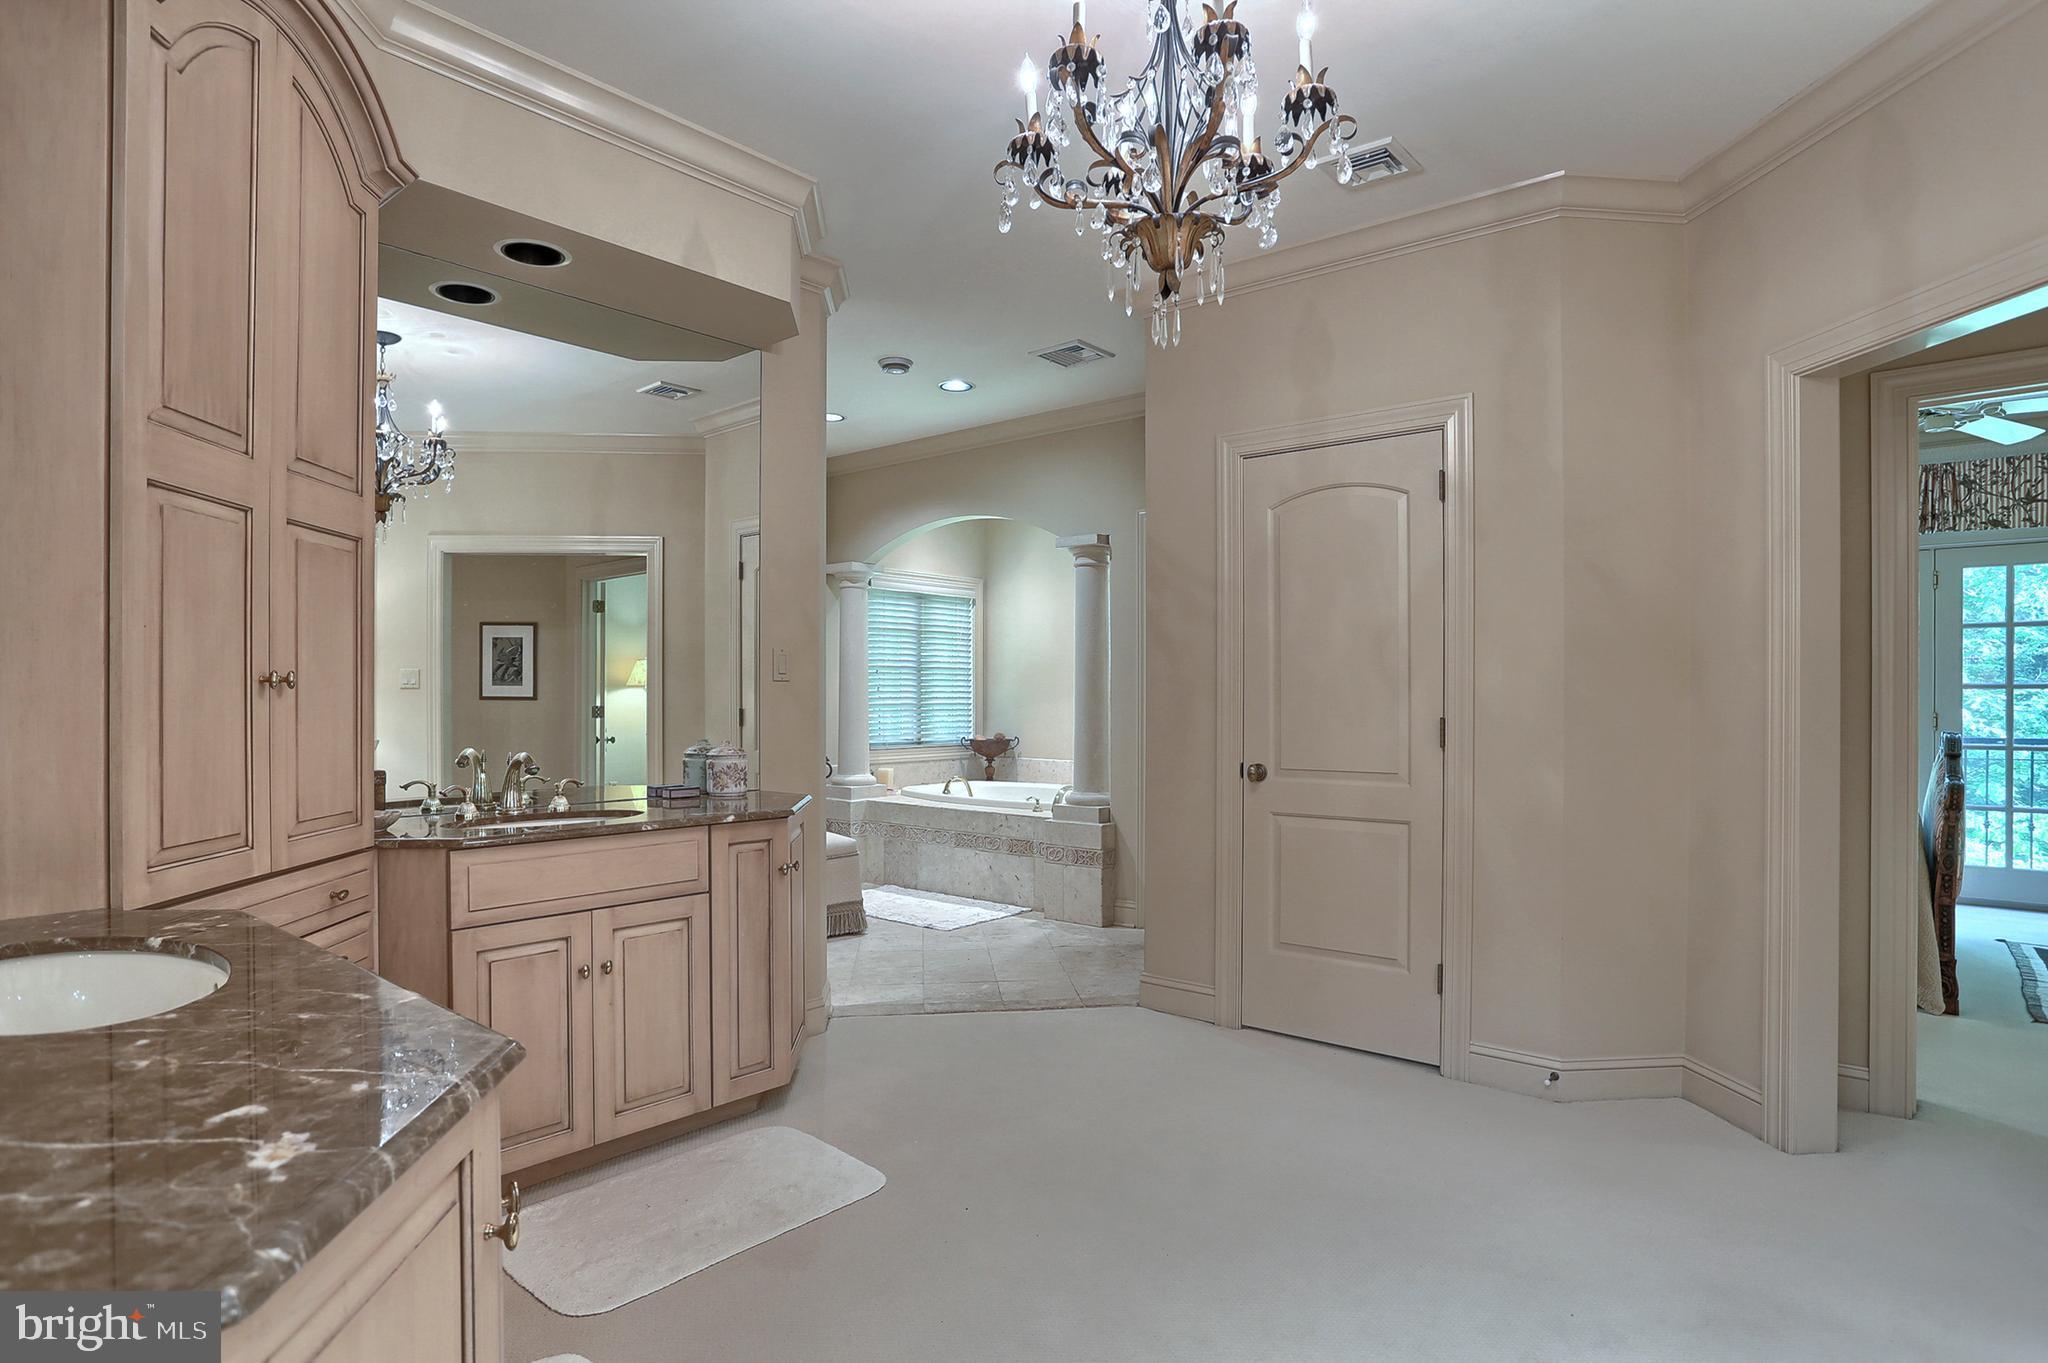 Looking toward bath/shower area from vanity area